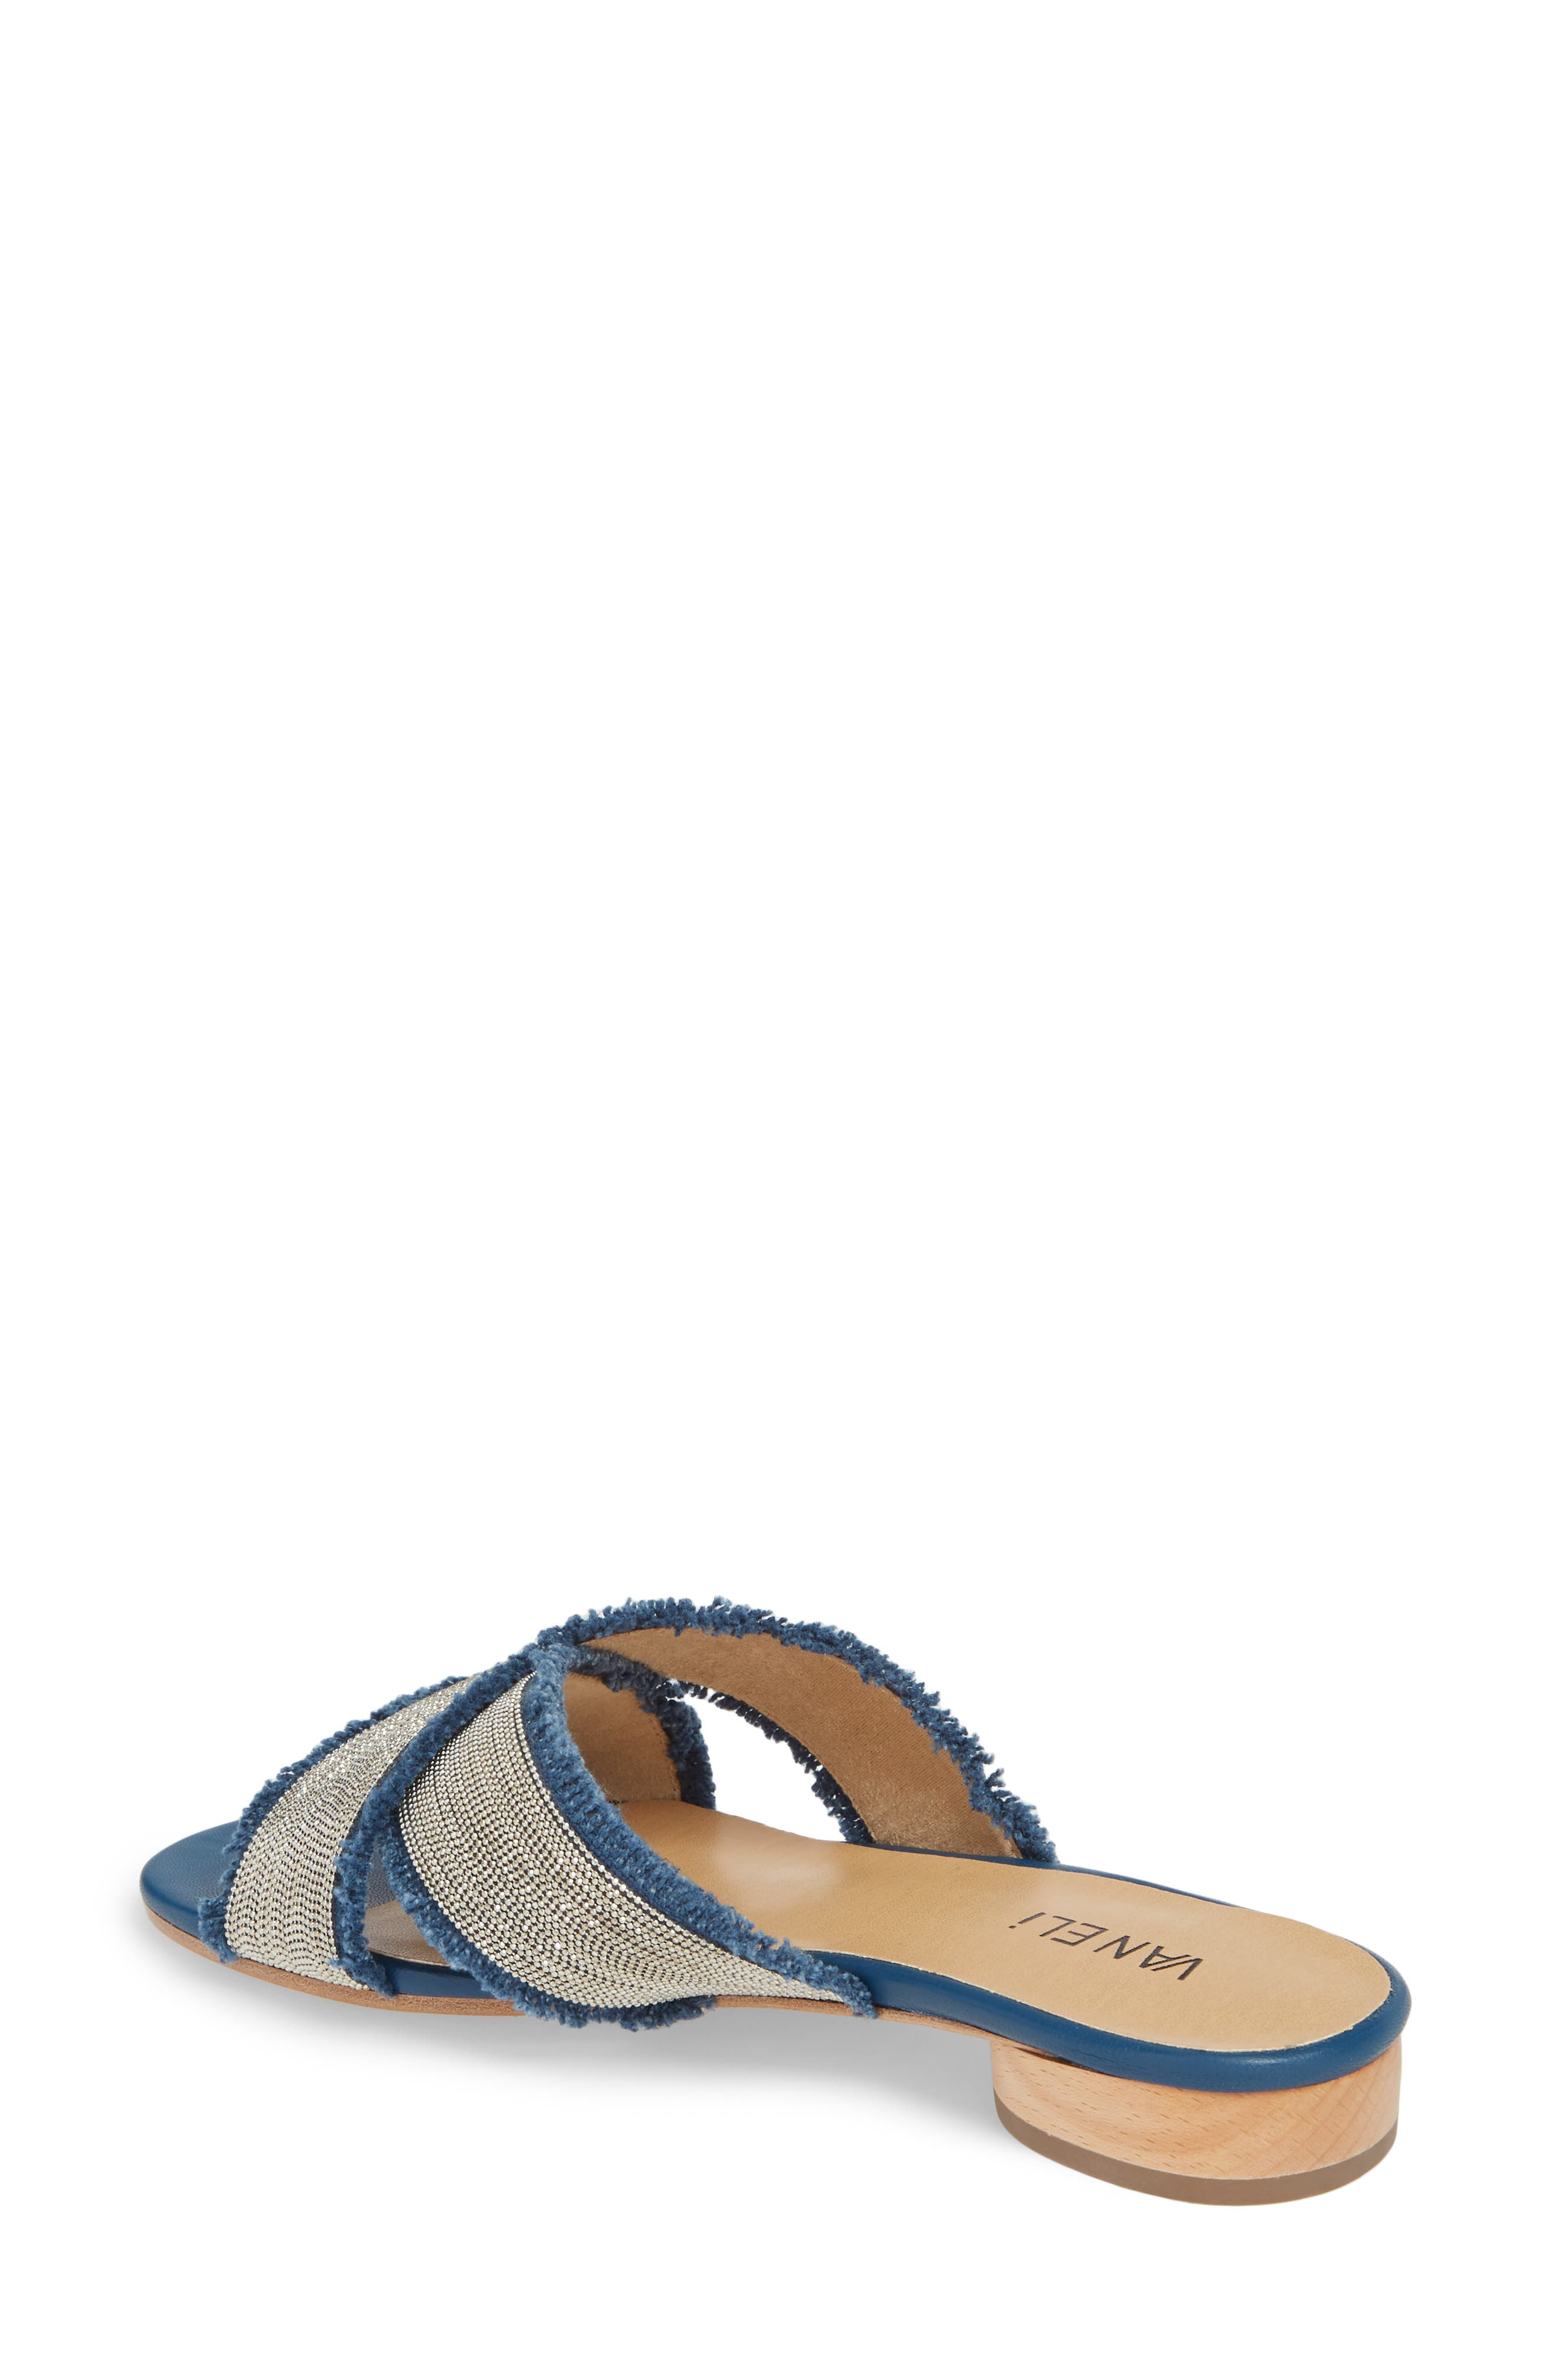 Baret Embellished Cross Strap Slide Sandal,                             Alternate thumbnail 2, color,                             Denim Fabric